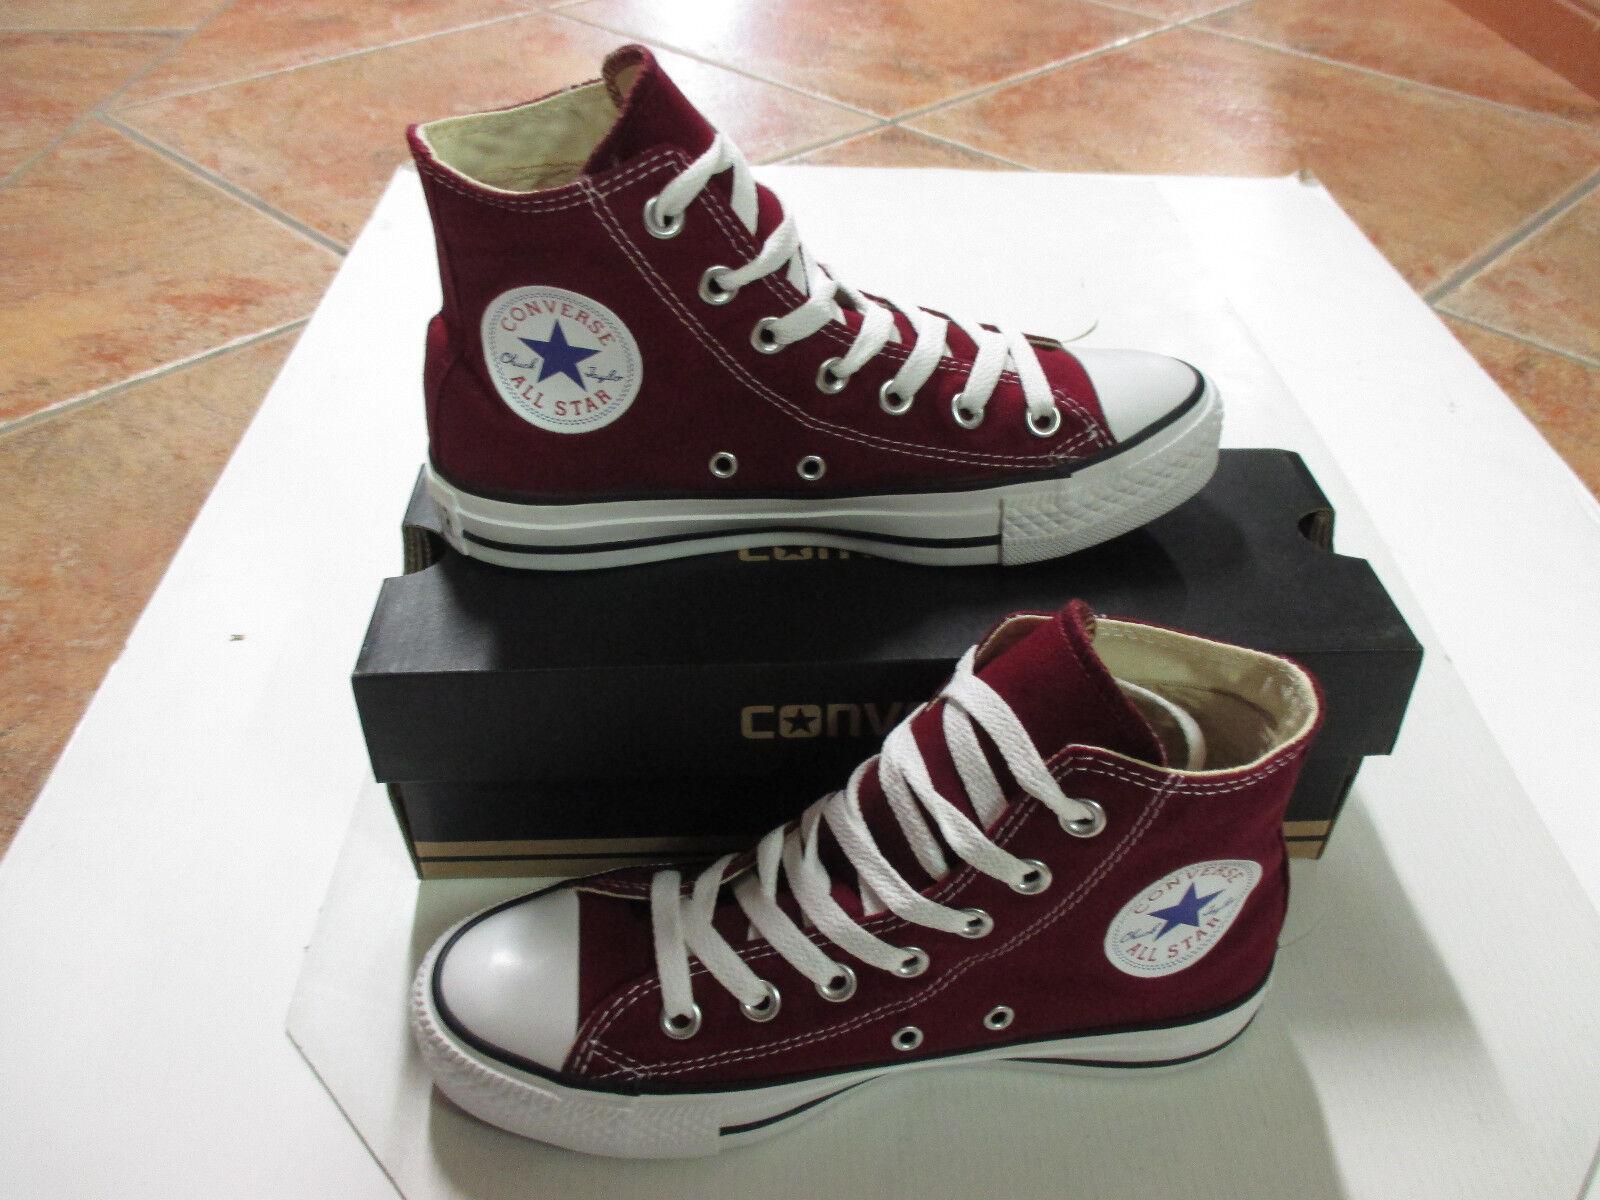 Converse Chucks All Star HI Größe 44 maroon weinrot M9613C Neu